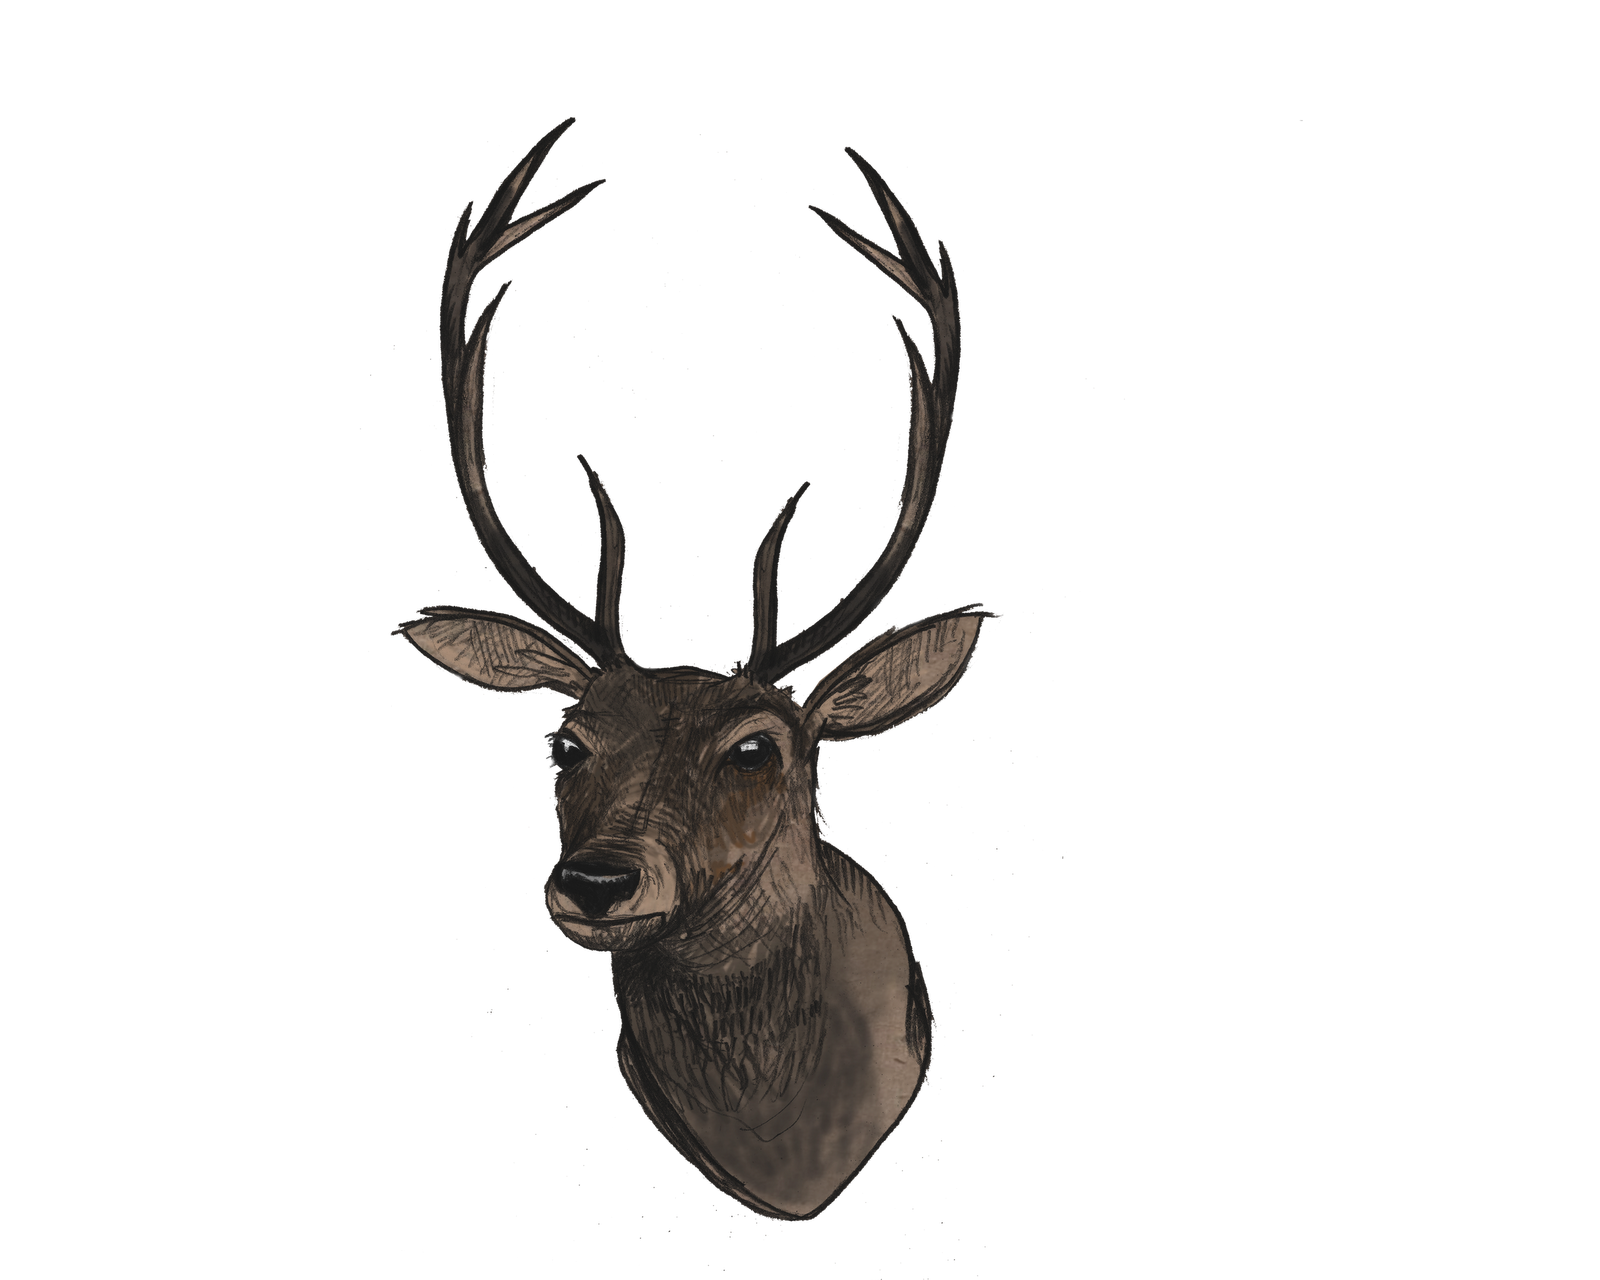 Png images transparent free. Deer clipart file